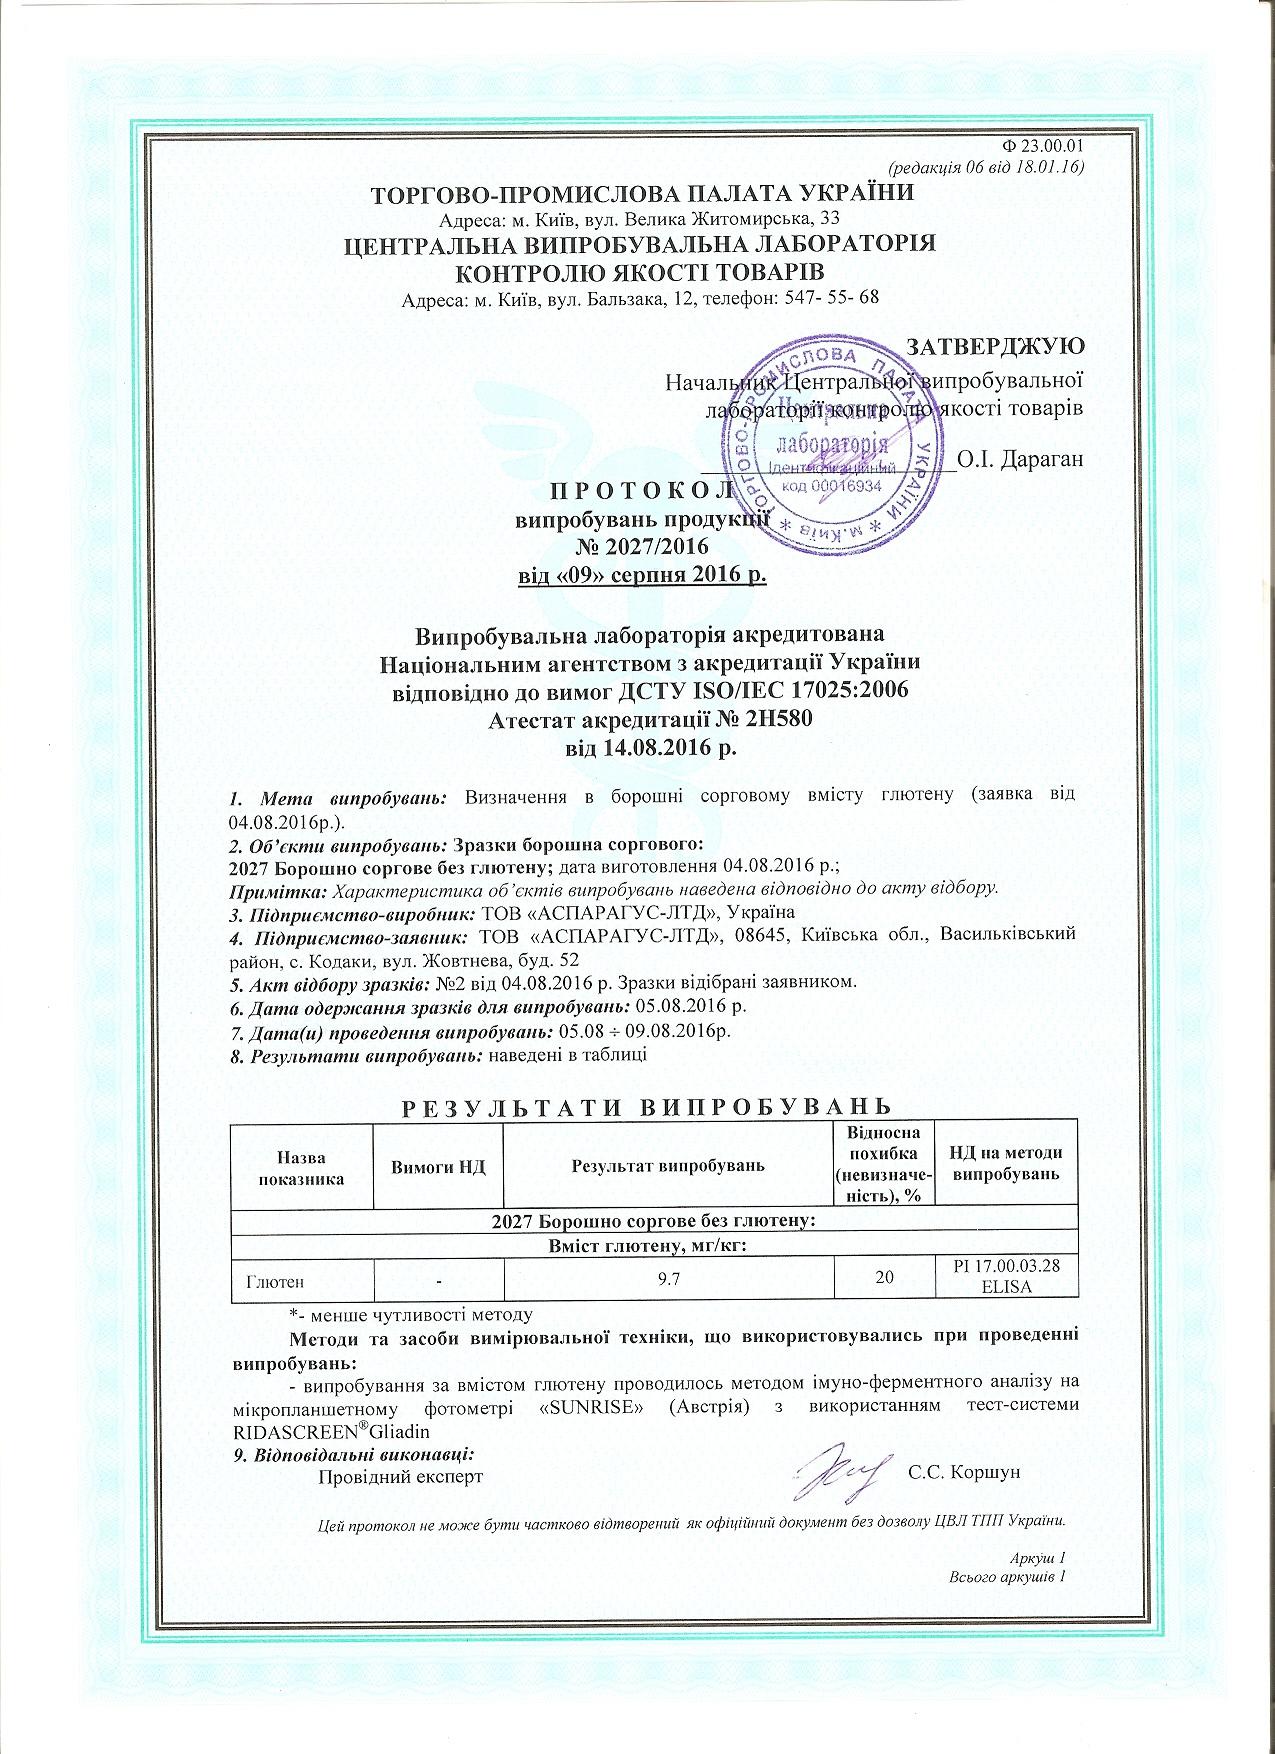 Аспарагус-ЛТД, ООО